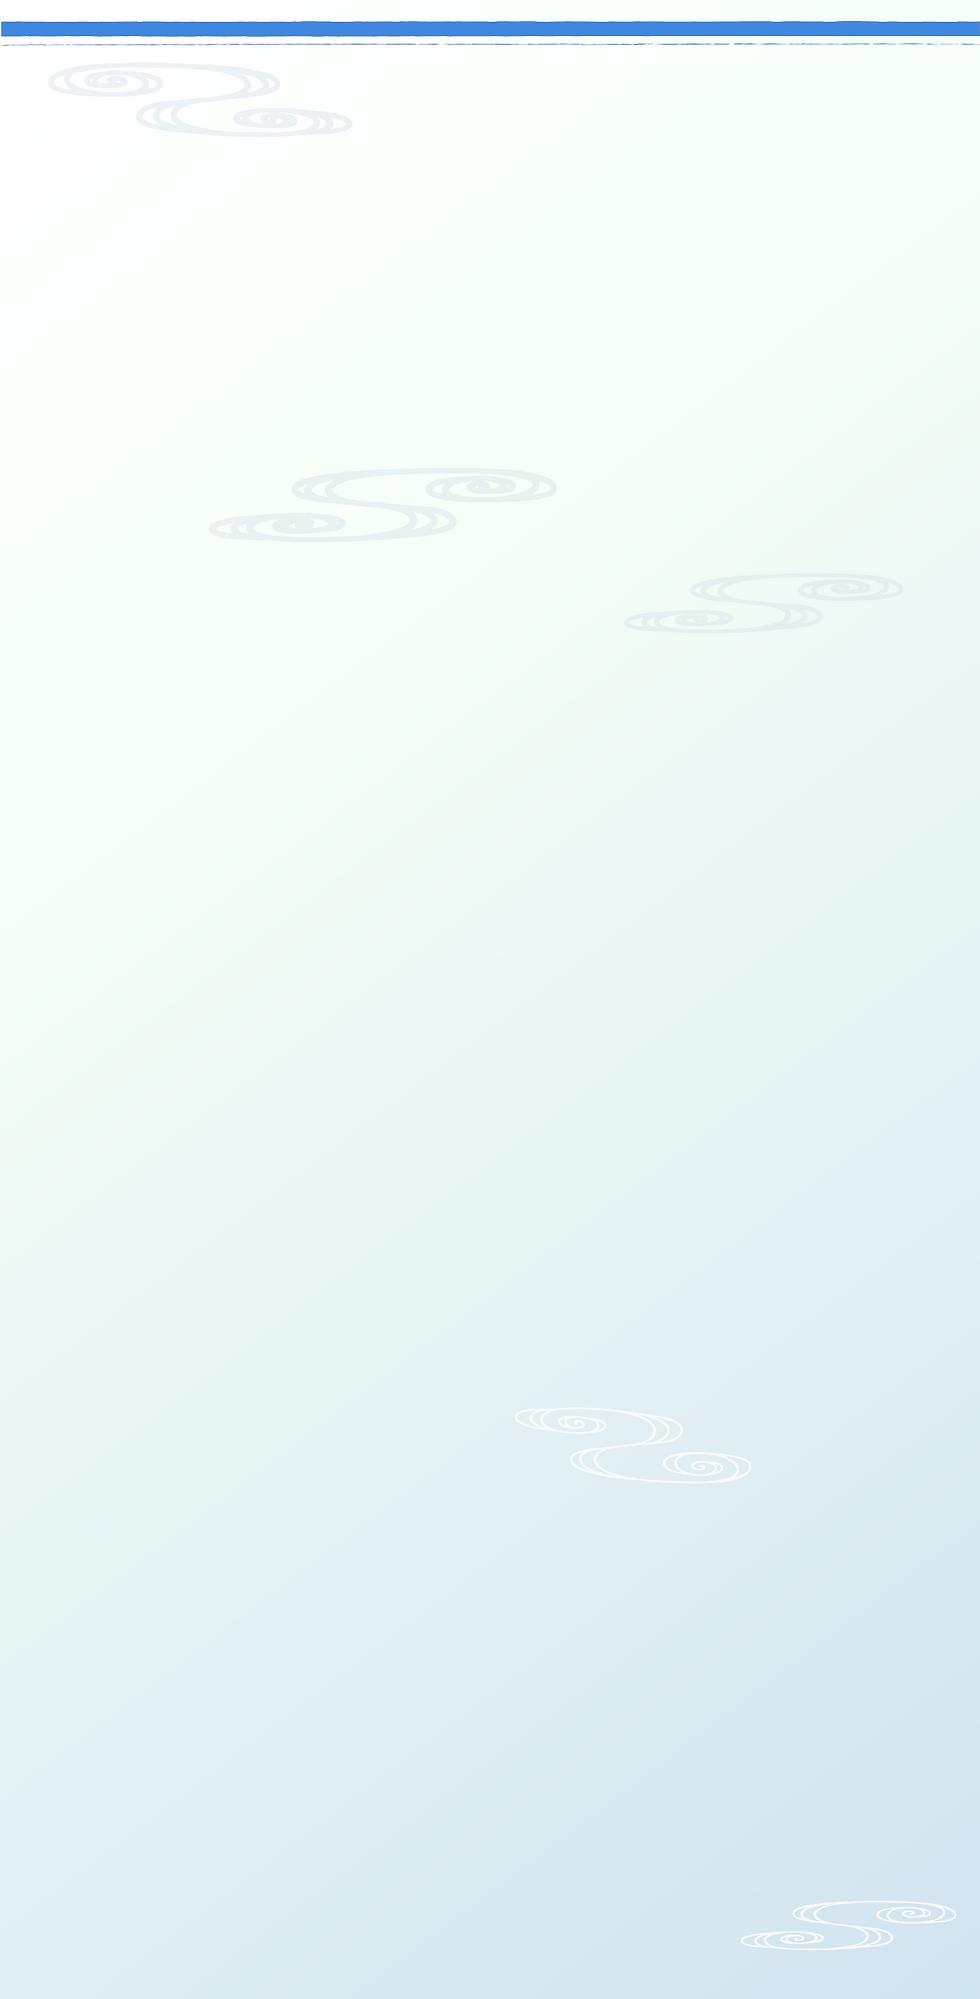 nara,japan,sake,奈良,西の京,きとら,試飲,試食,やたがらす,北岡本店,酒,吉野,開山忌,鑑真,期間限定,奈良漬,冷酒,吟冷,吉野物語,瓜,